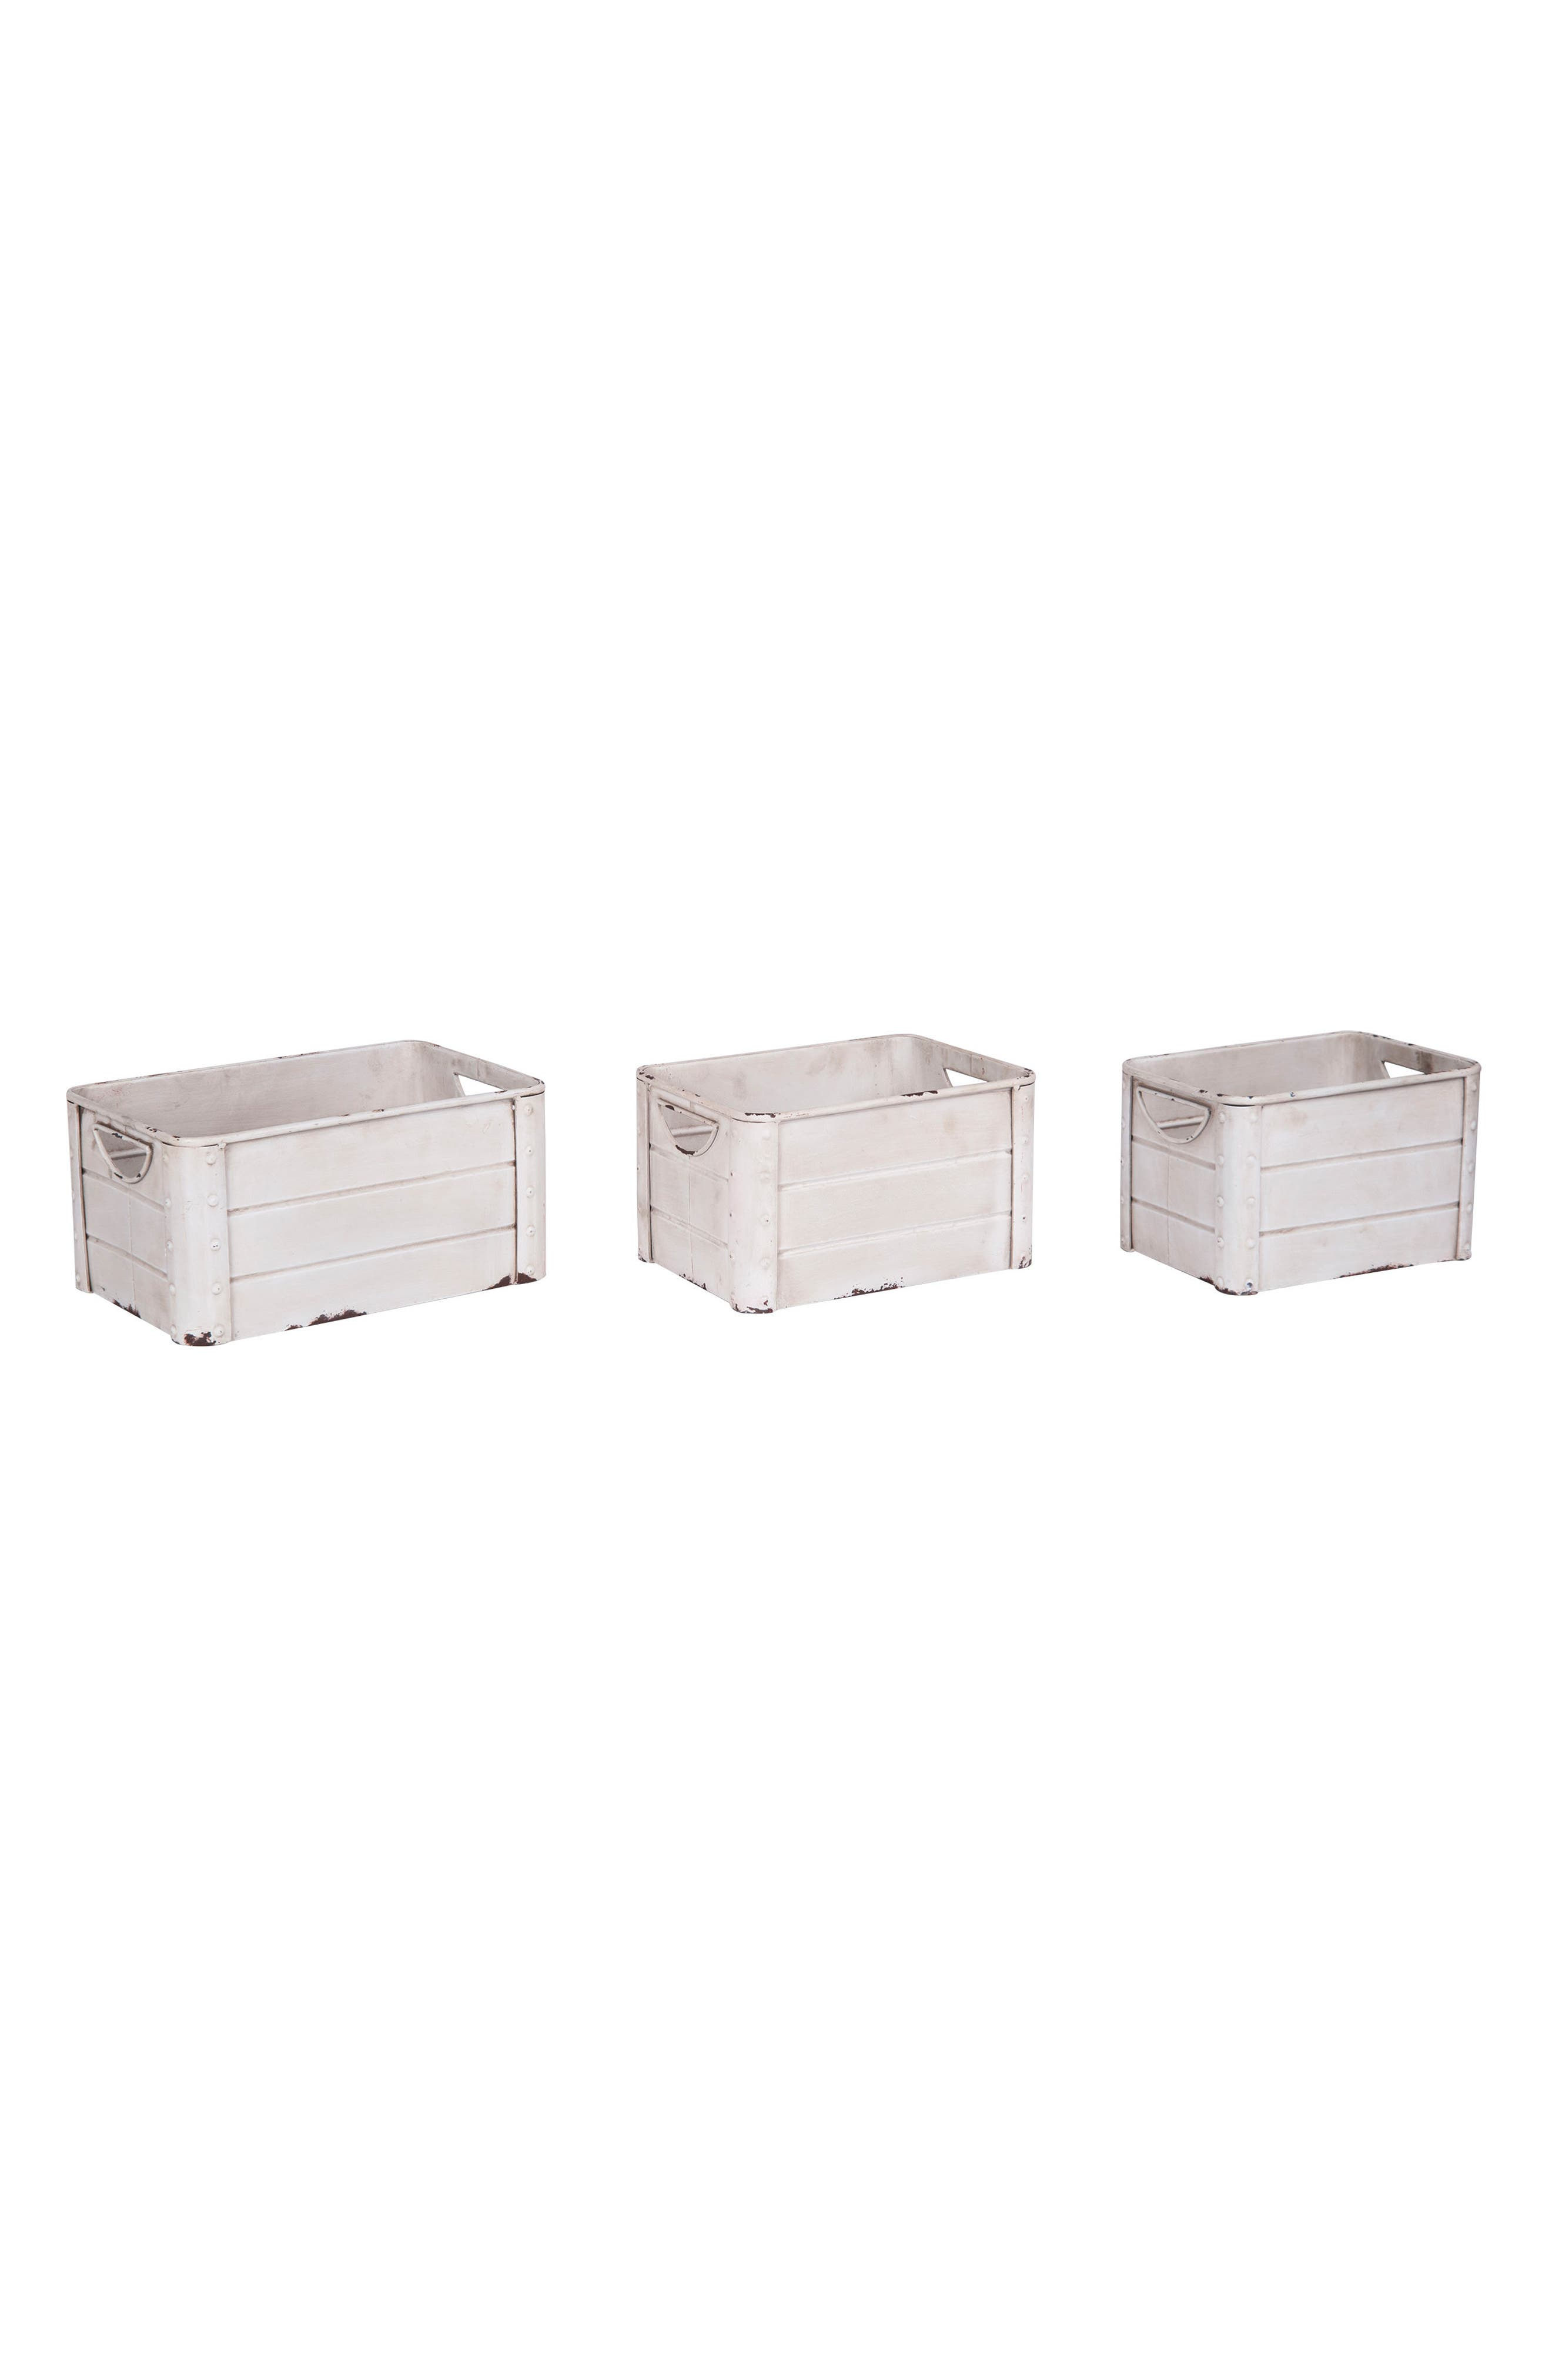 Shorehand Set of 3 Crates,                         Main,                         color, Metal